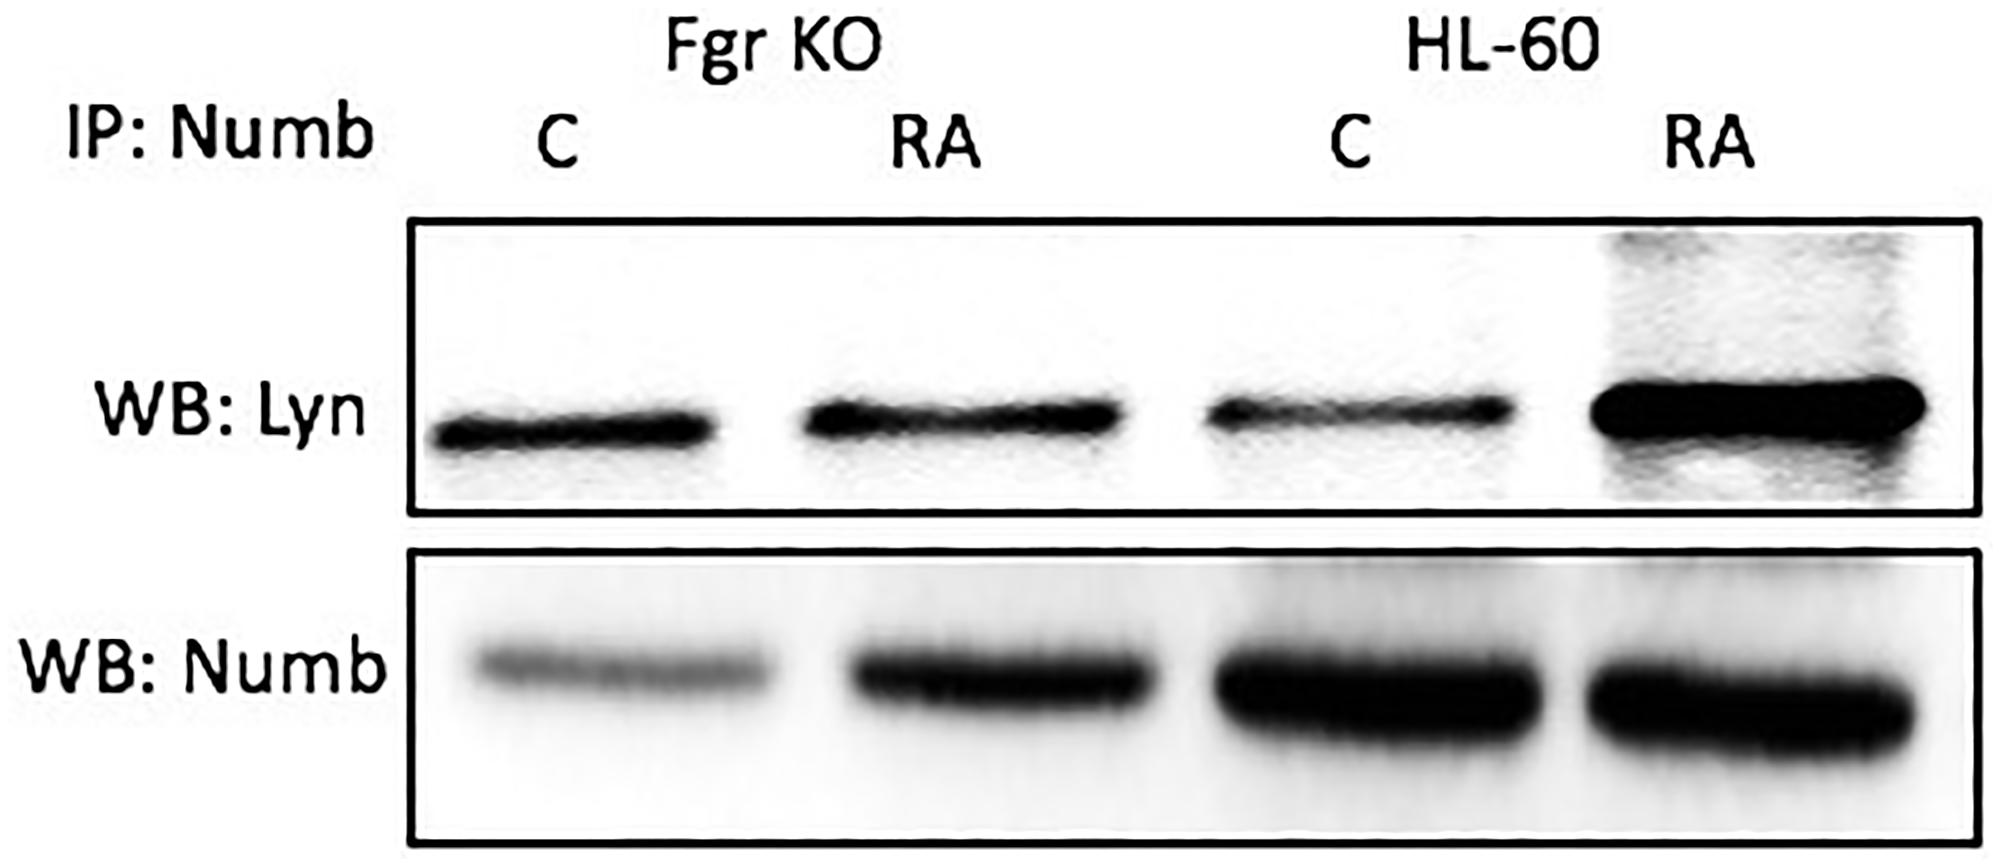 Numb binding Lyn in HL-60 wt and Fgr KO cells assayed by immunoprecipitation.